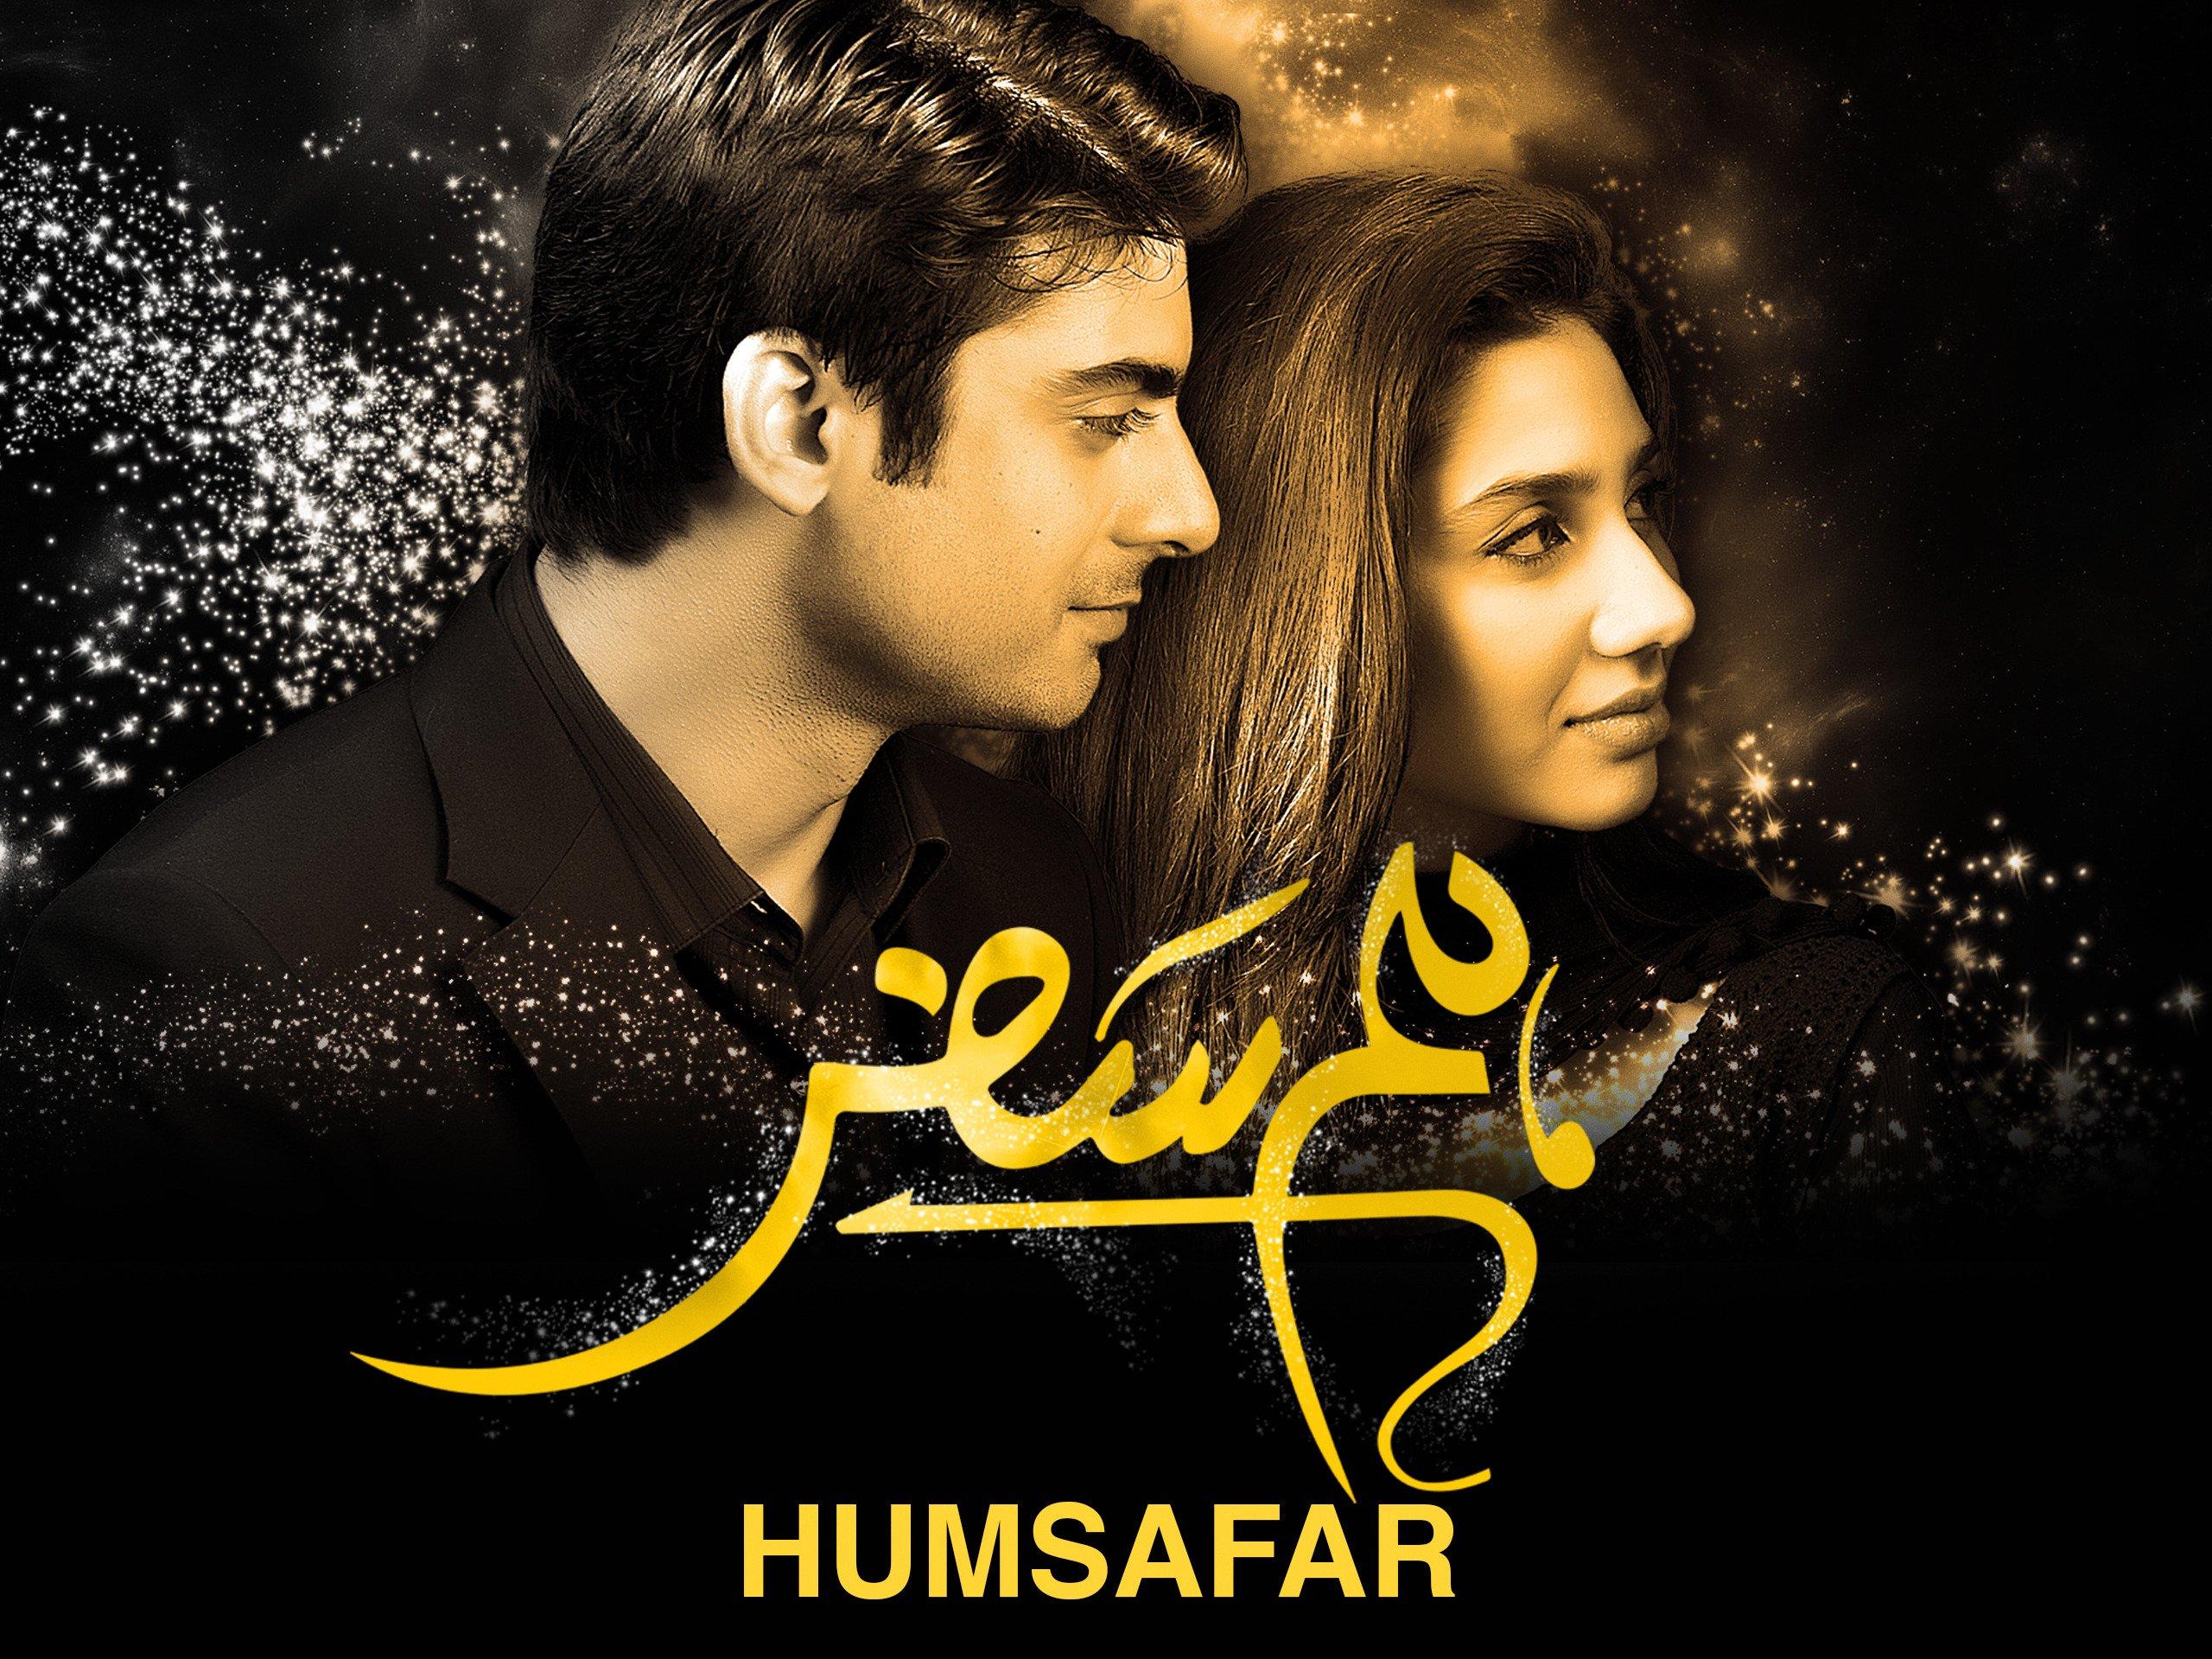 Humsafar episode 18 download